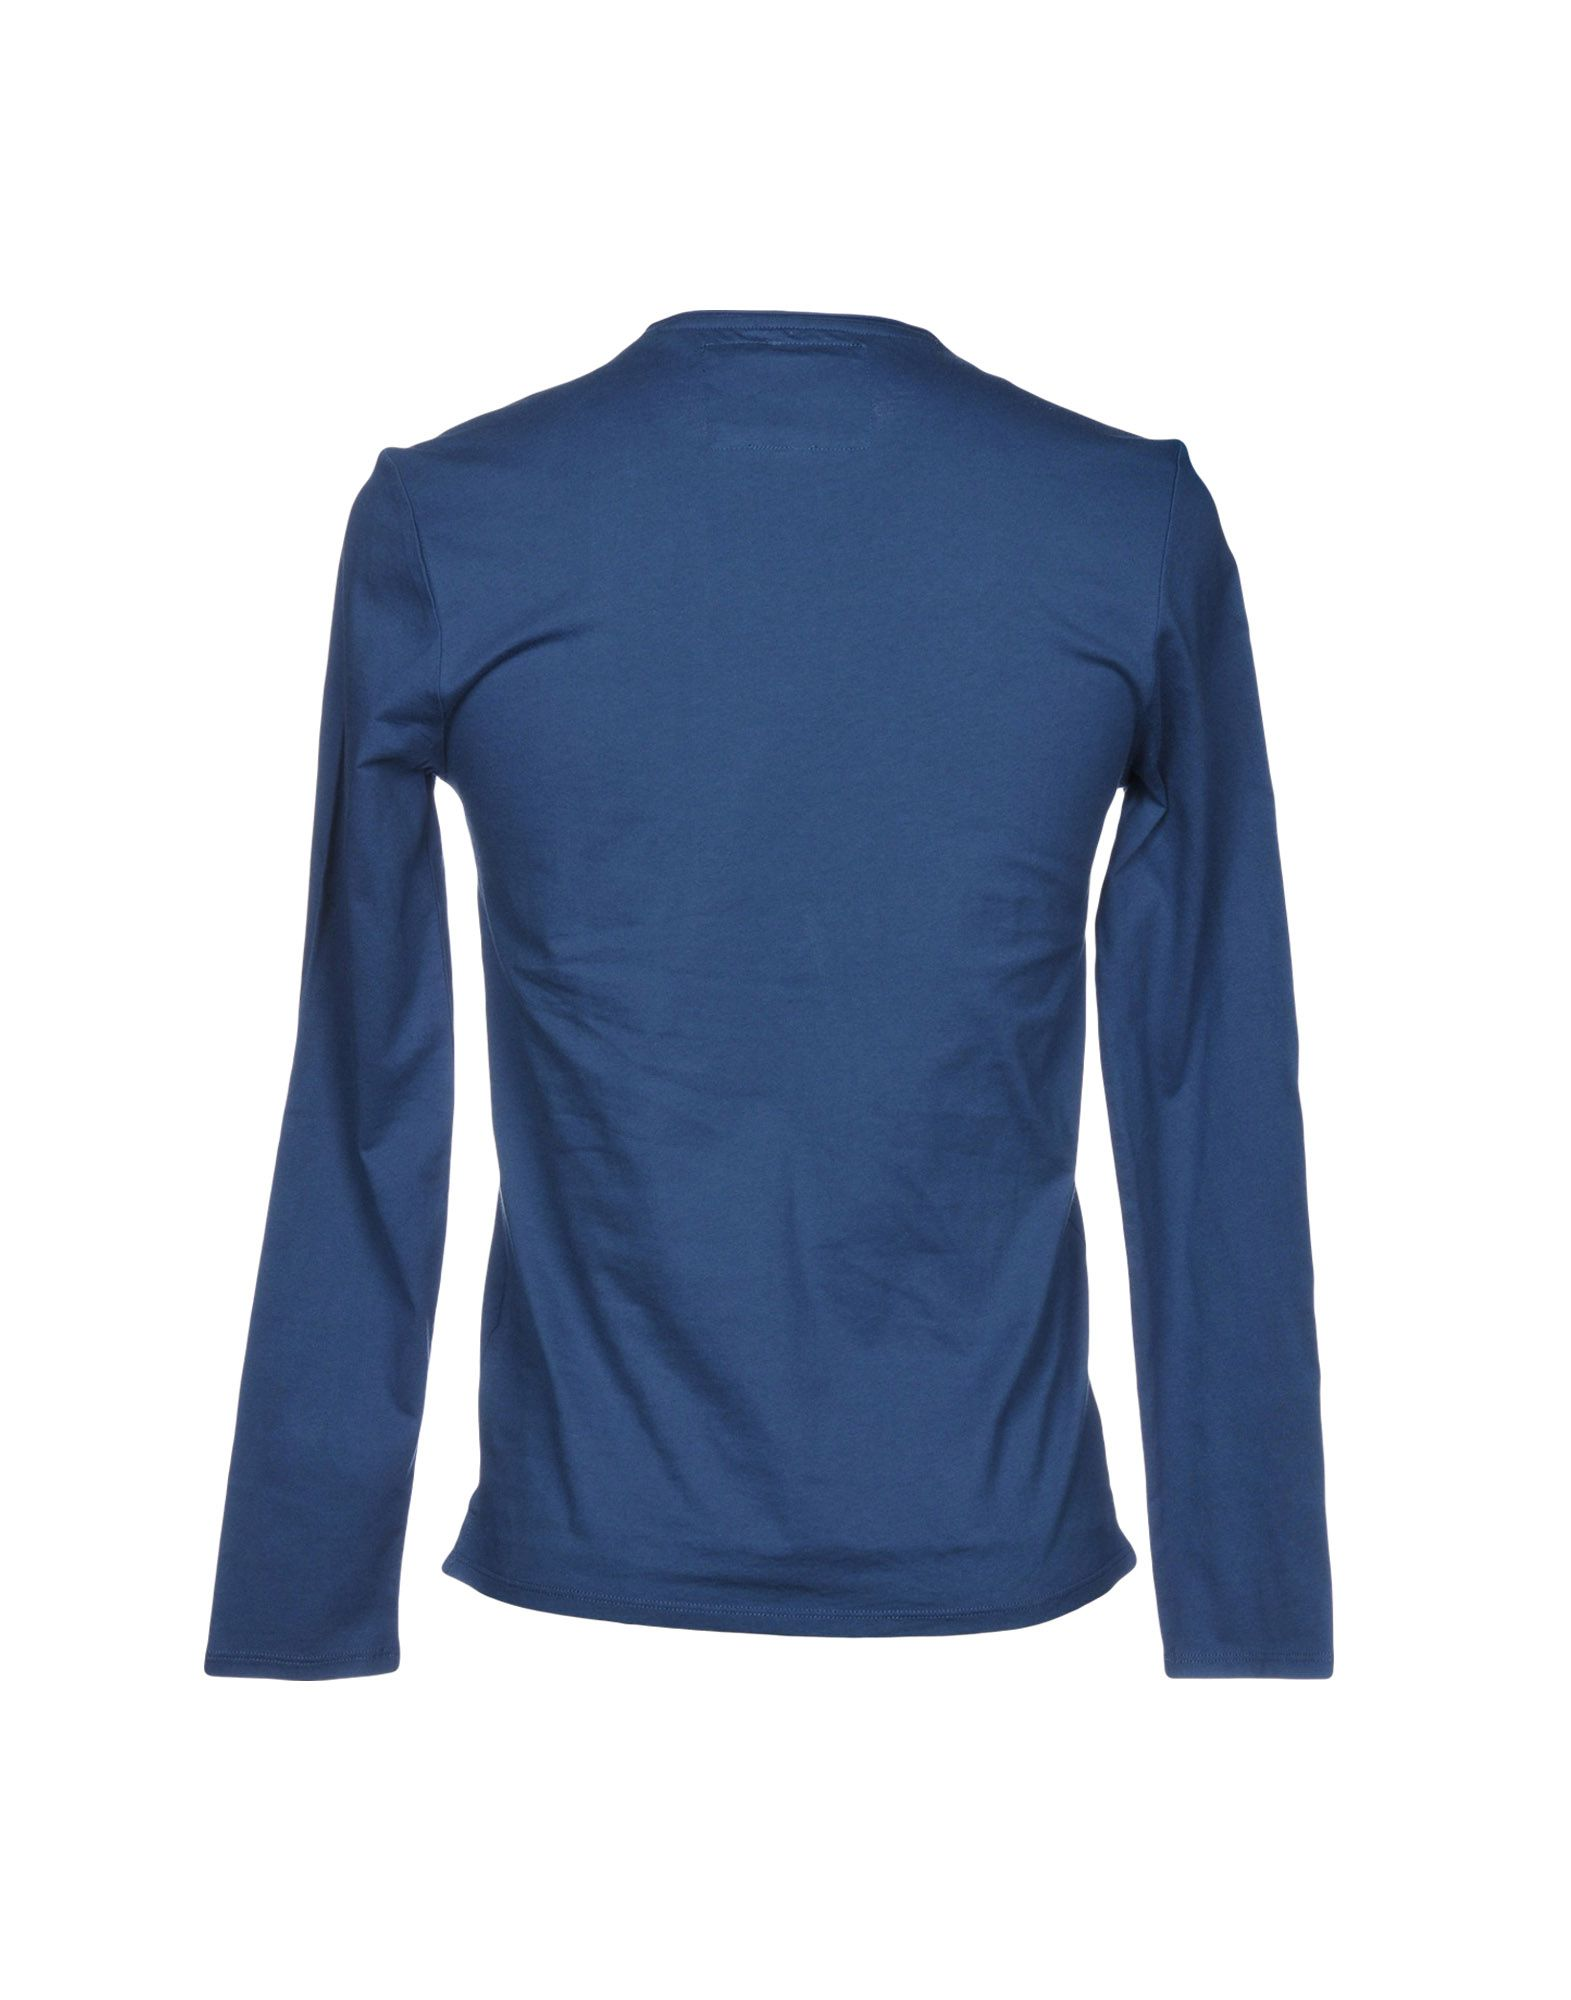 A T-Shirt buon mercato A buon mercato T-Shirt A Guess Uomo - 12179414UO ac5021